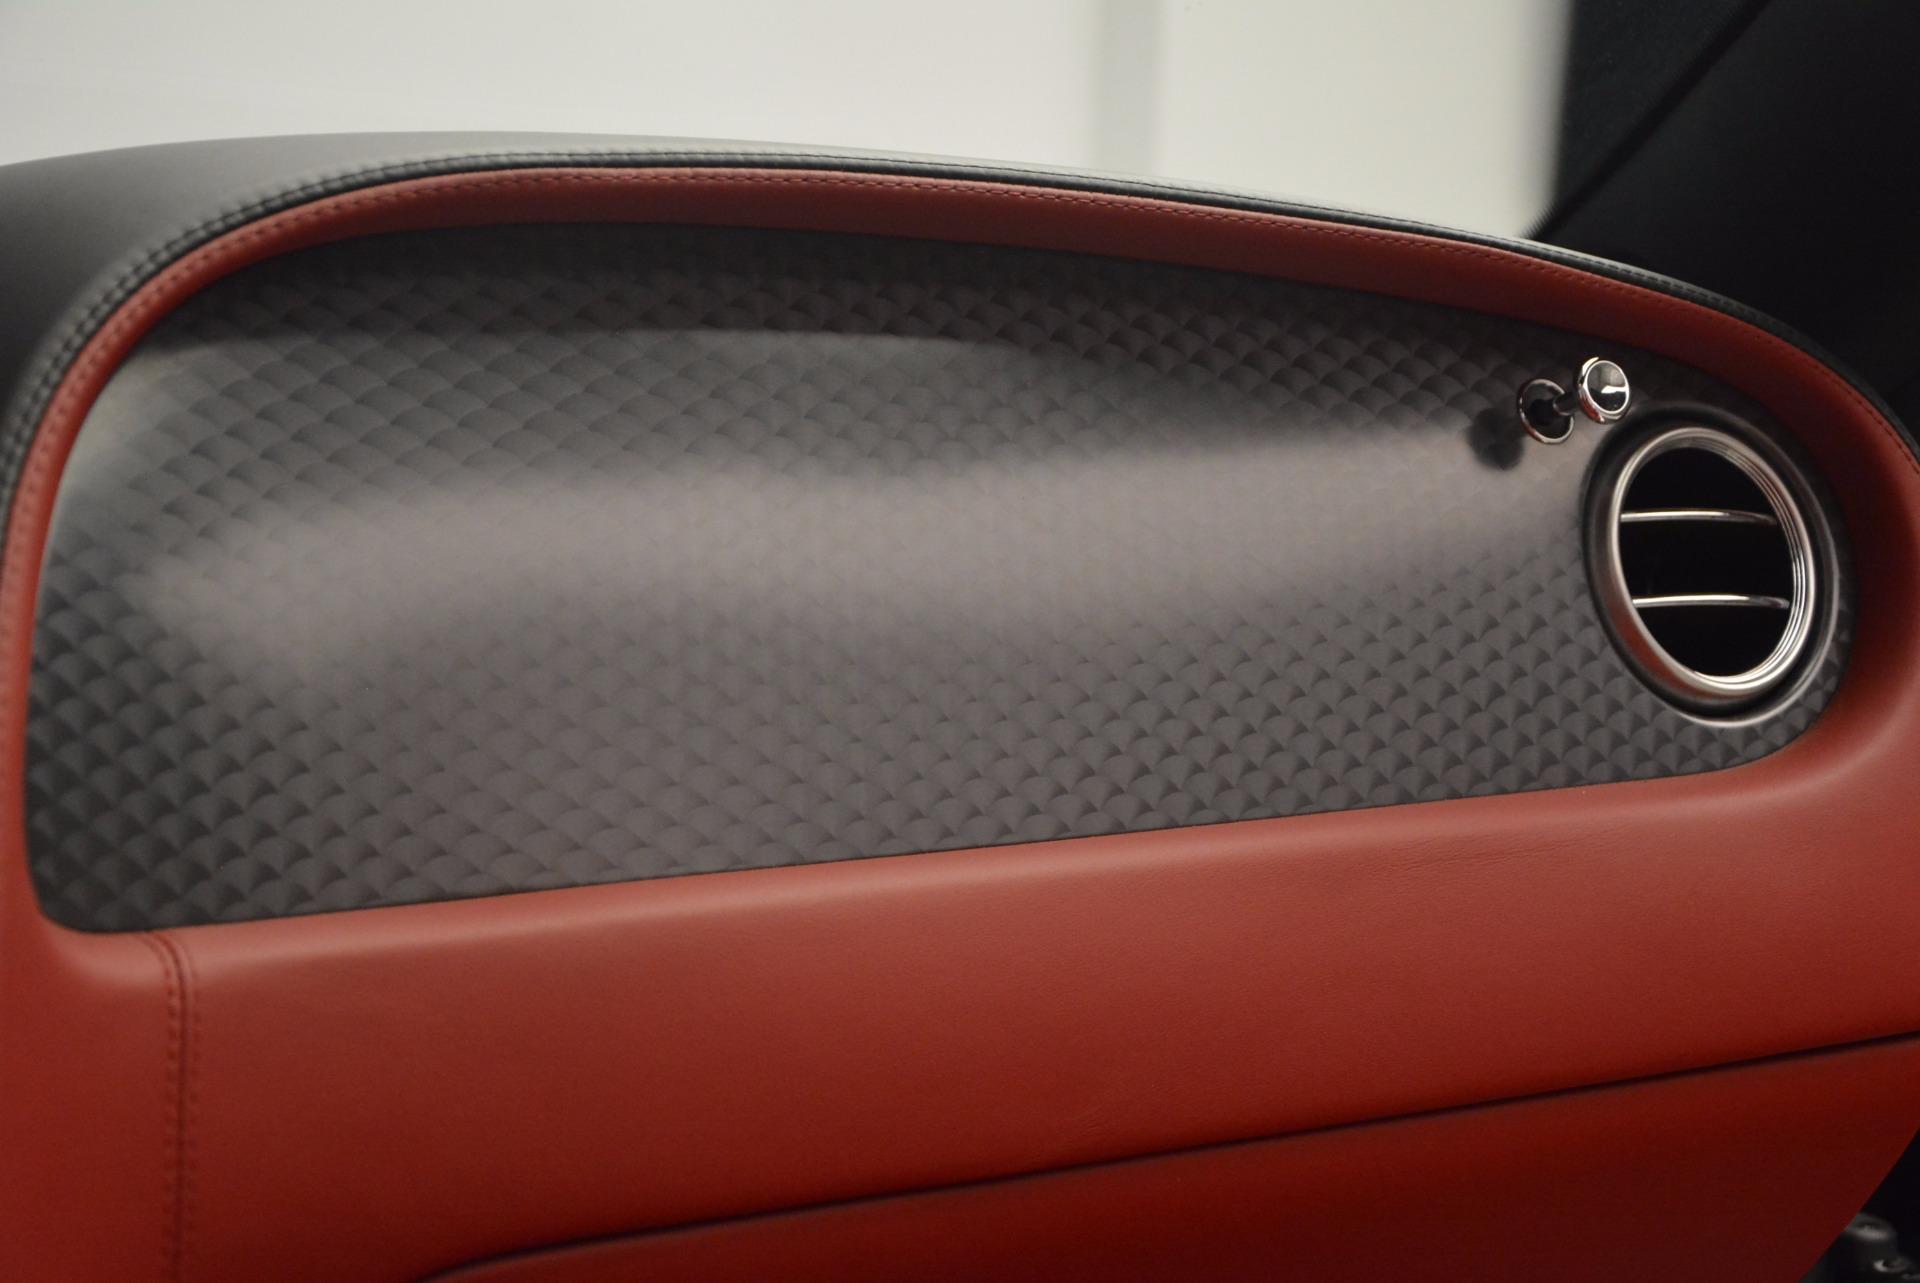 Used 2010 Bentley Continental GT Speed For Sale In Westport, CT 1298_p50